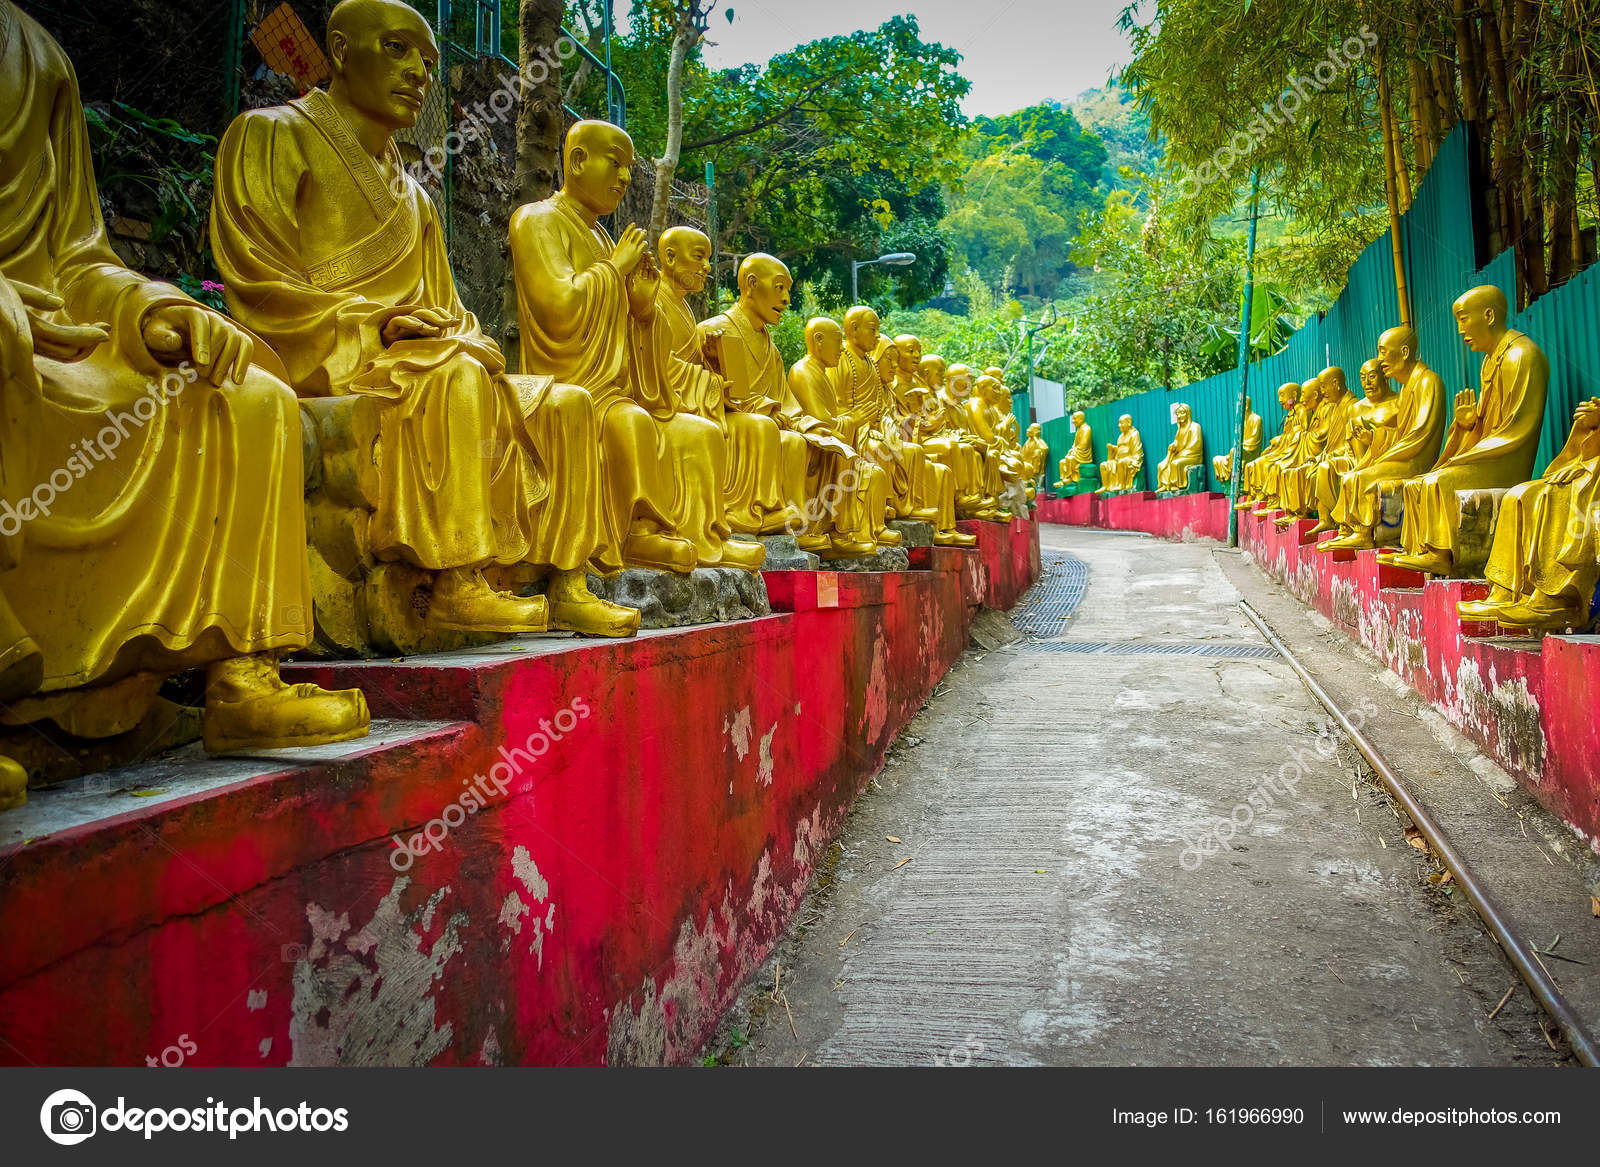 Statues At Ten Thousand Buddhas Monastery In Sha Tin Hong Kong China Stock Photo By C Pxhidalgo 161966990